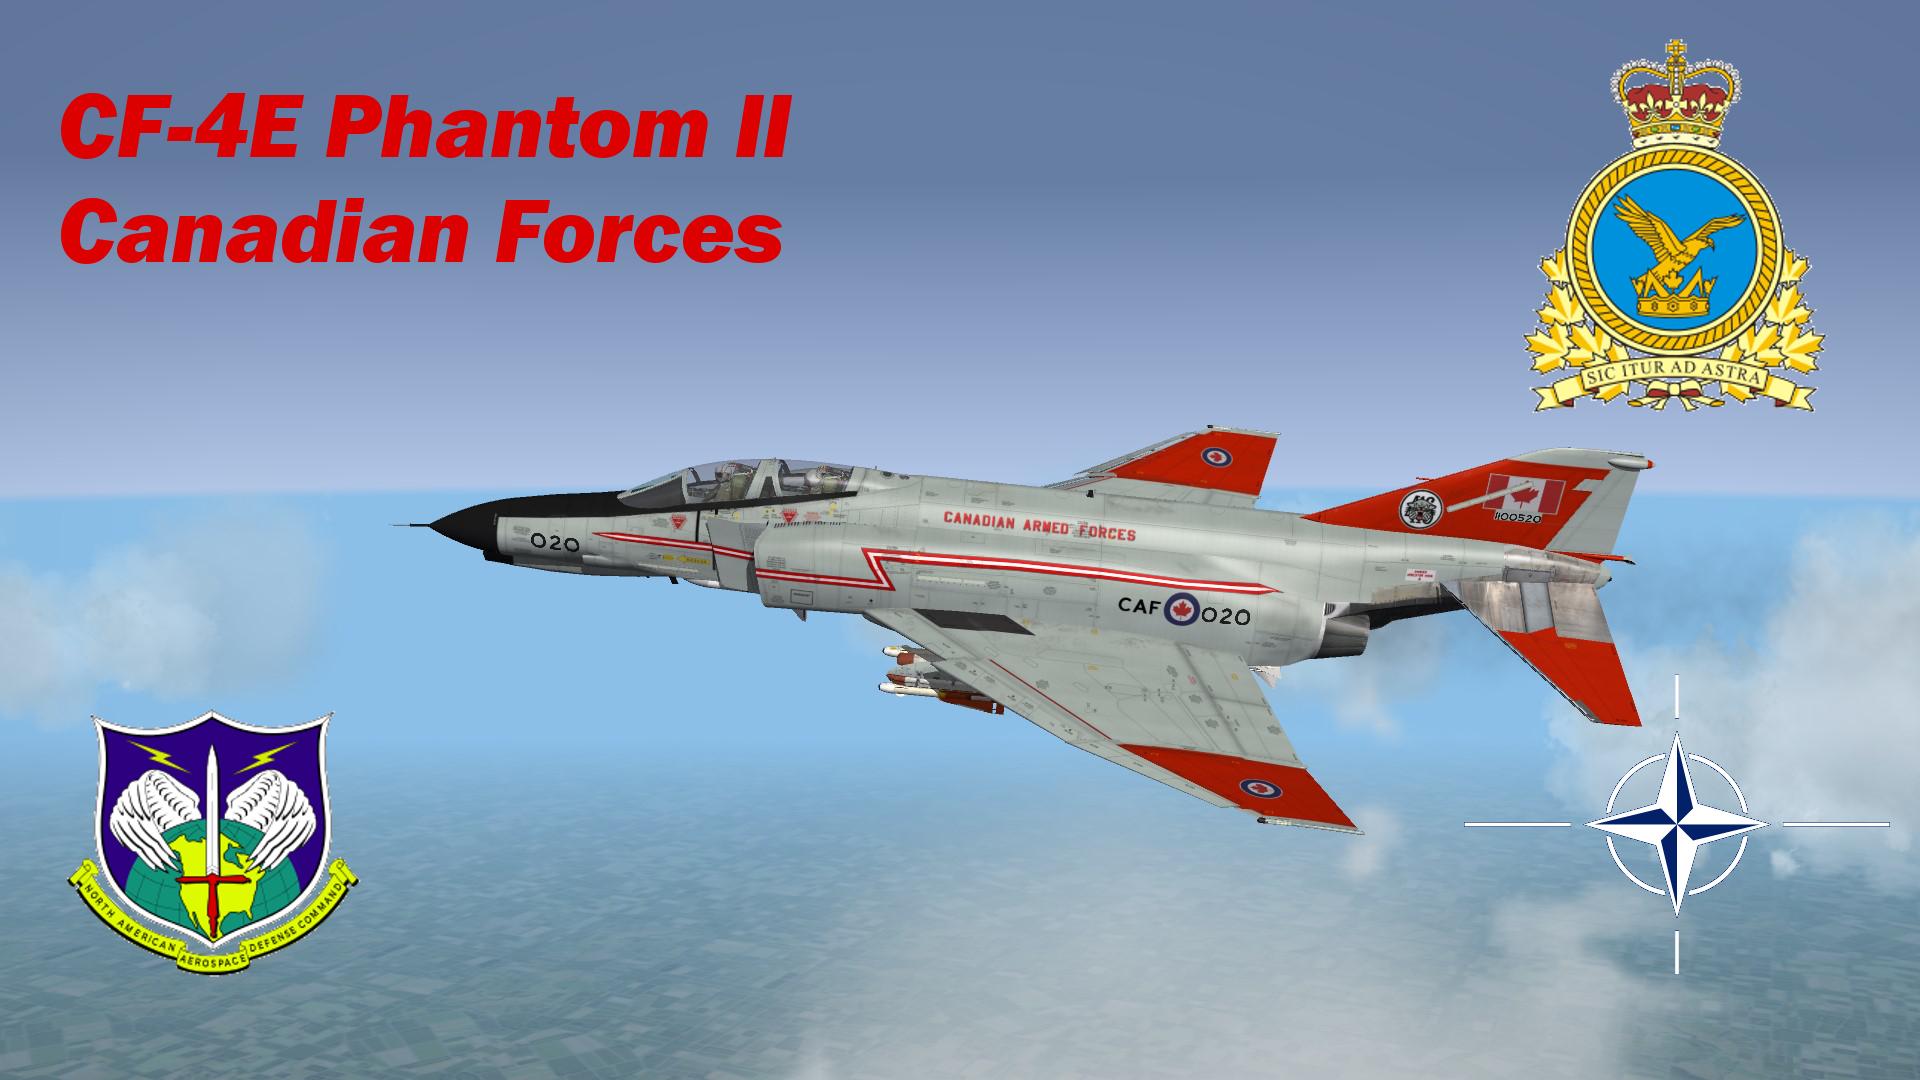 CF-4E Phantom II - Canadian Forces - Part 1